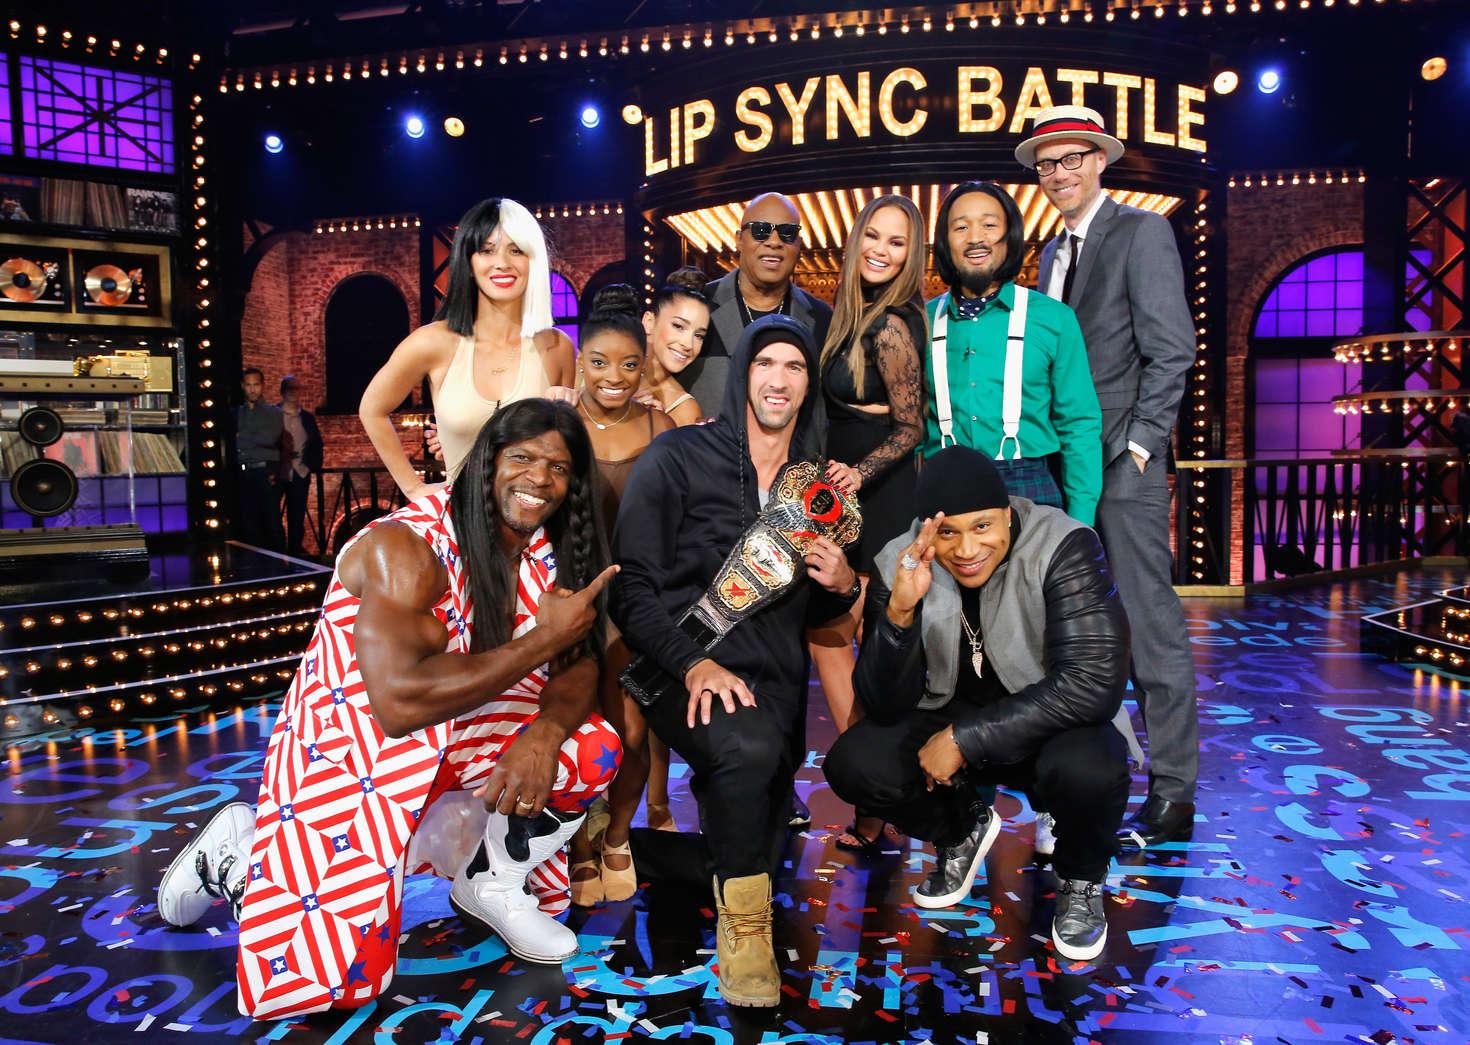 Olivia Munn 2016 : Olivia Munn Aly Raisman and Simone Biles: Lip Sync Battle All-Stars Live -11